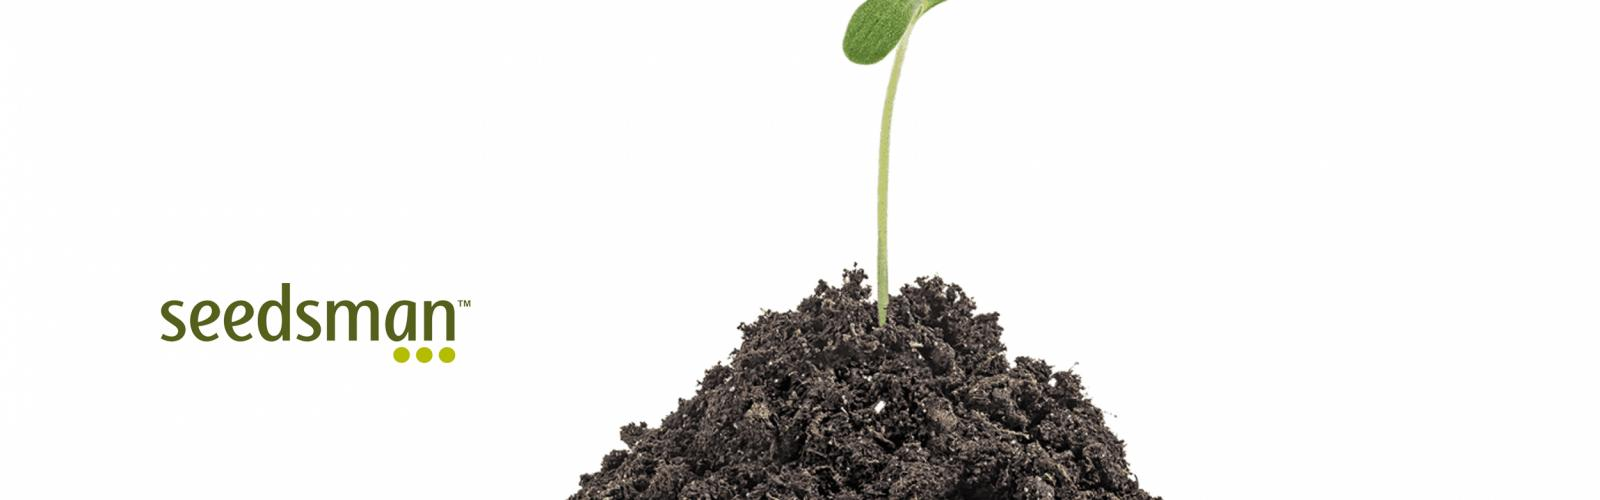 Seedsman Autoflowering Cannabis Seeds